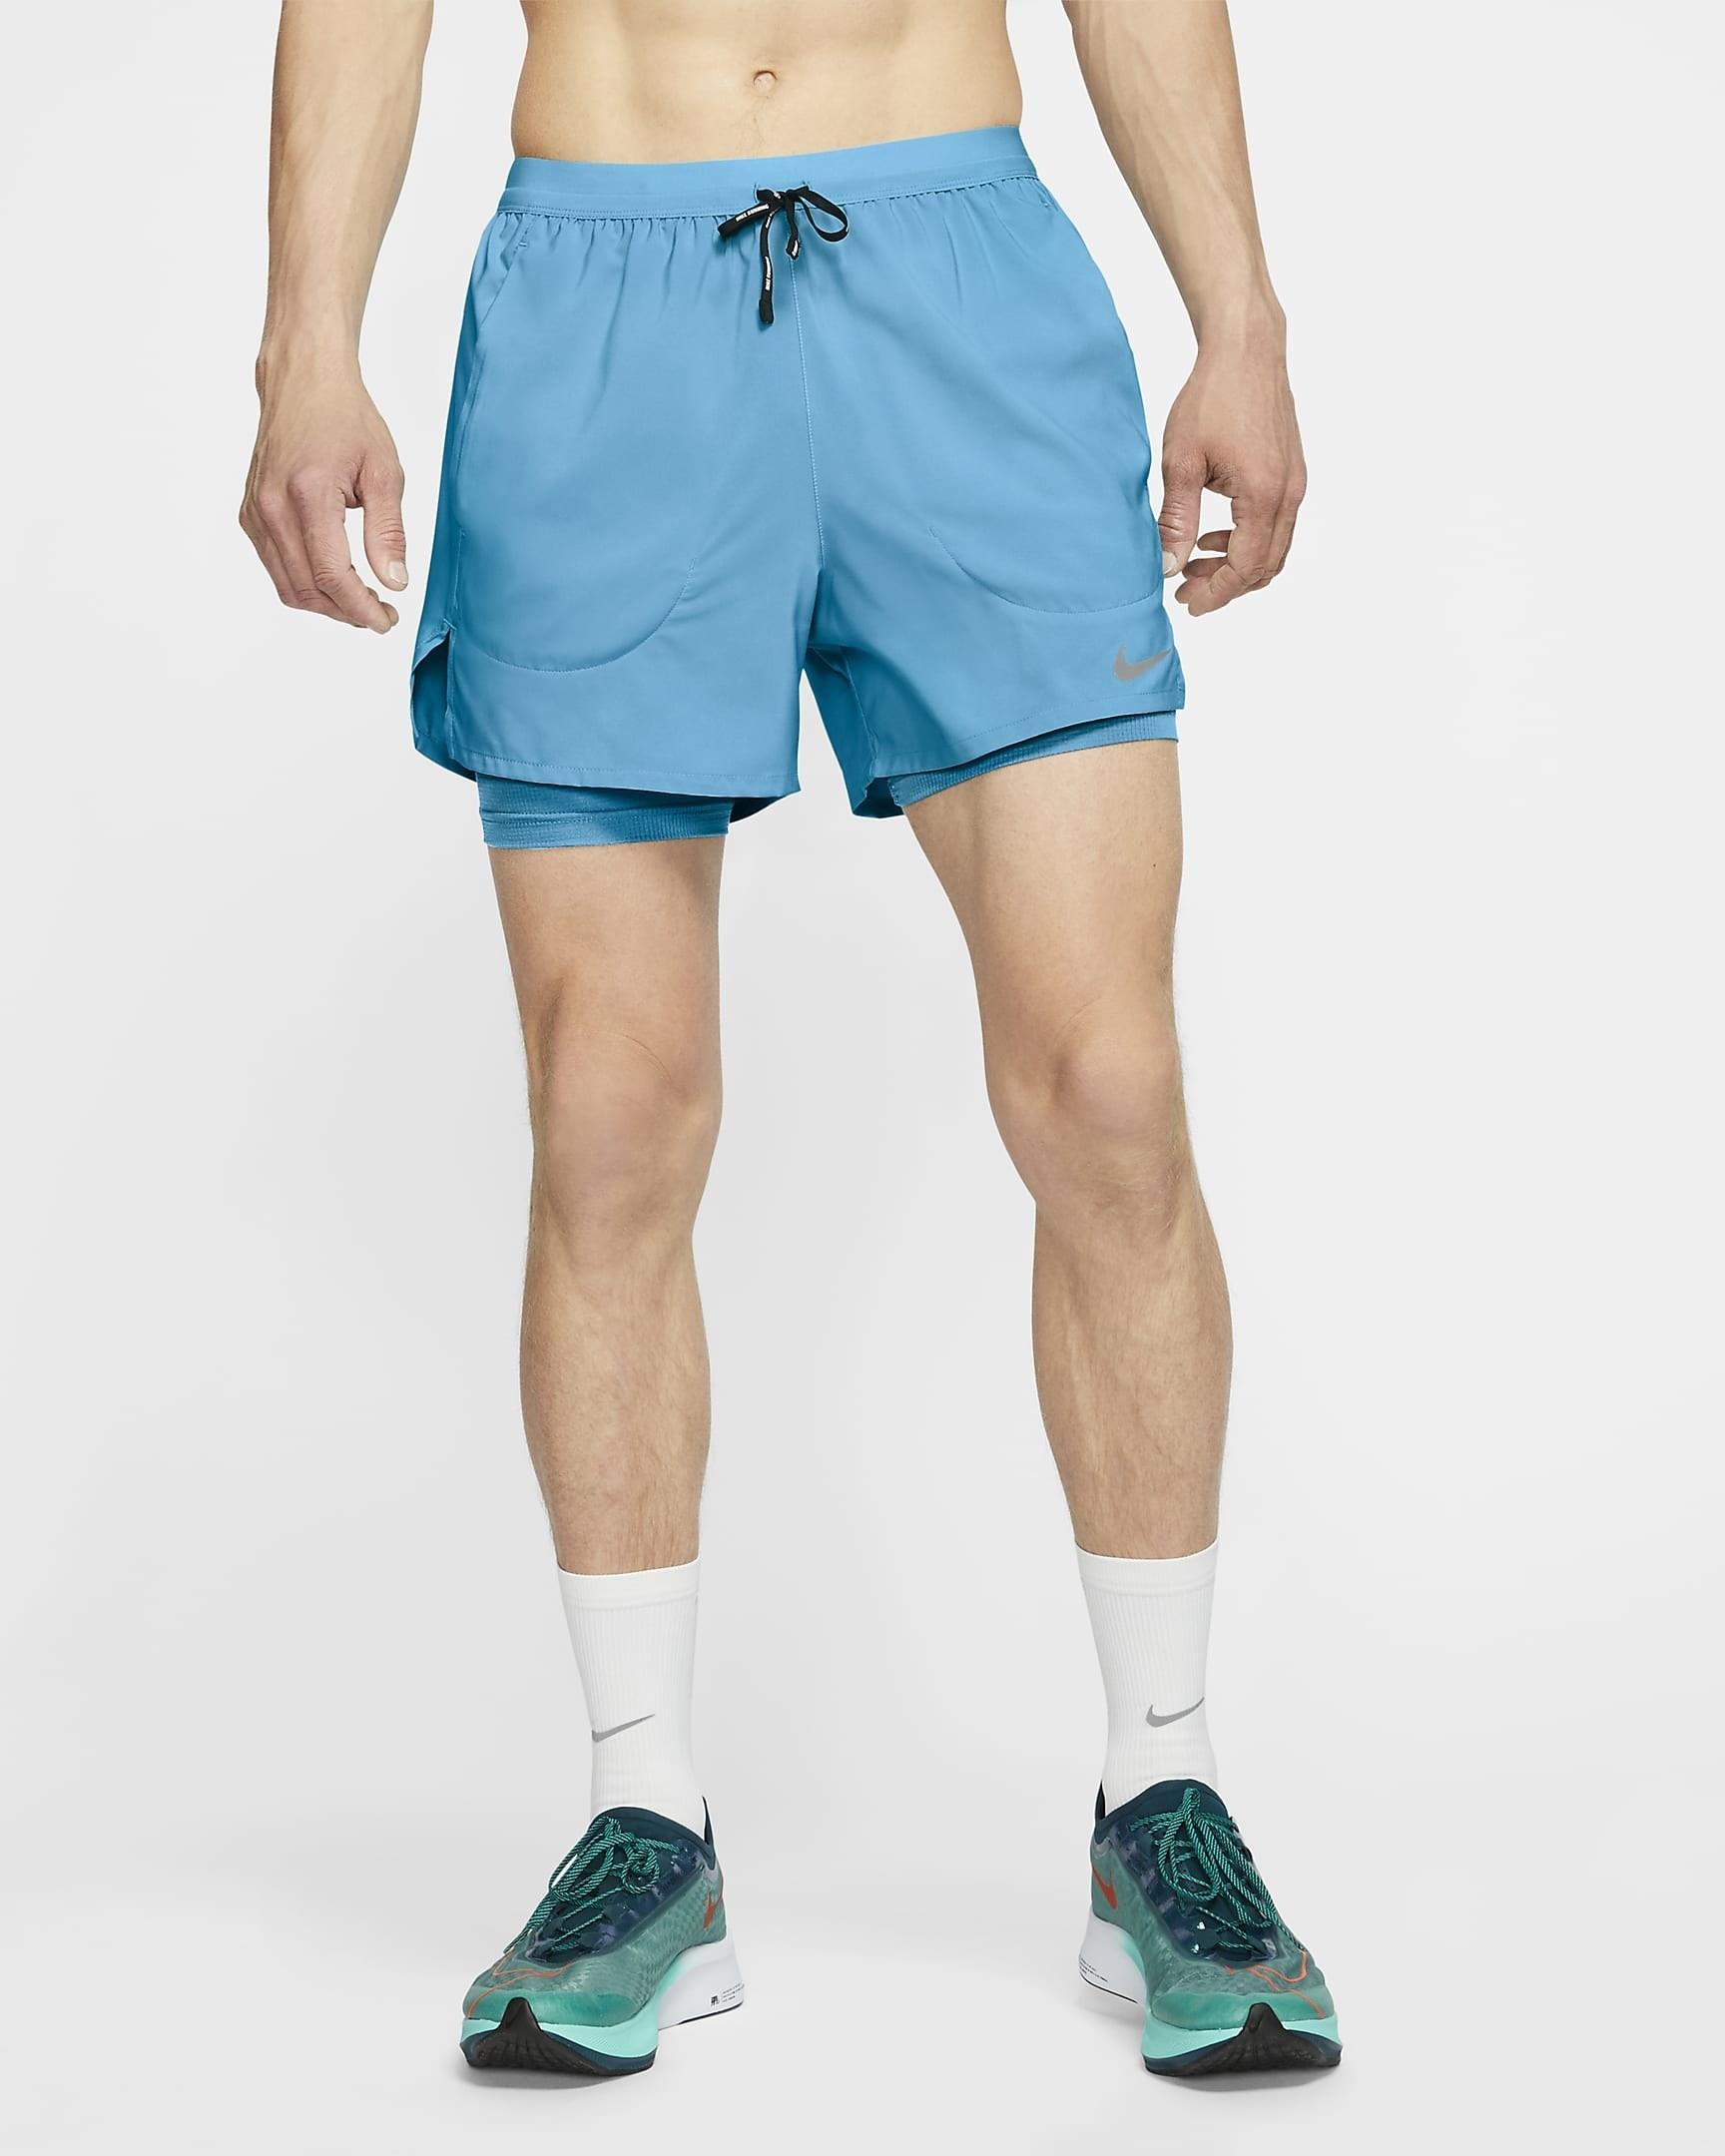 Model wearing blue Nike stride shorts